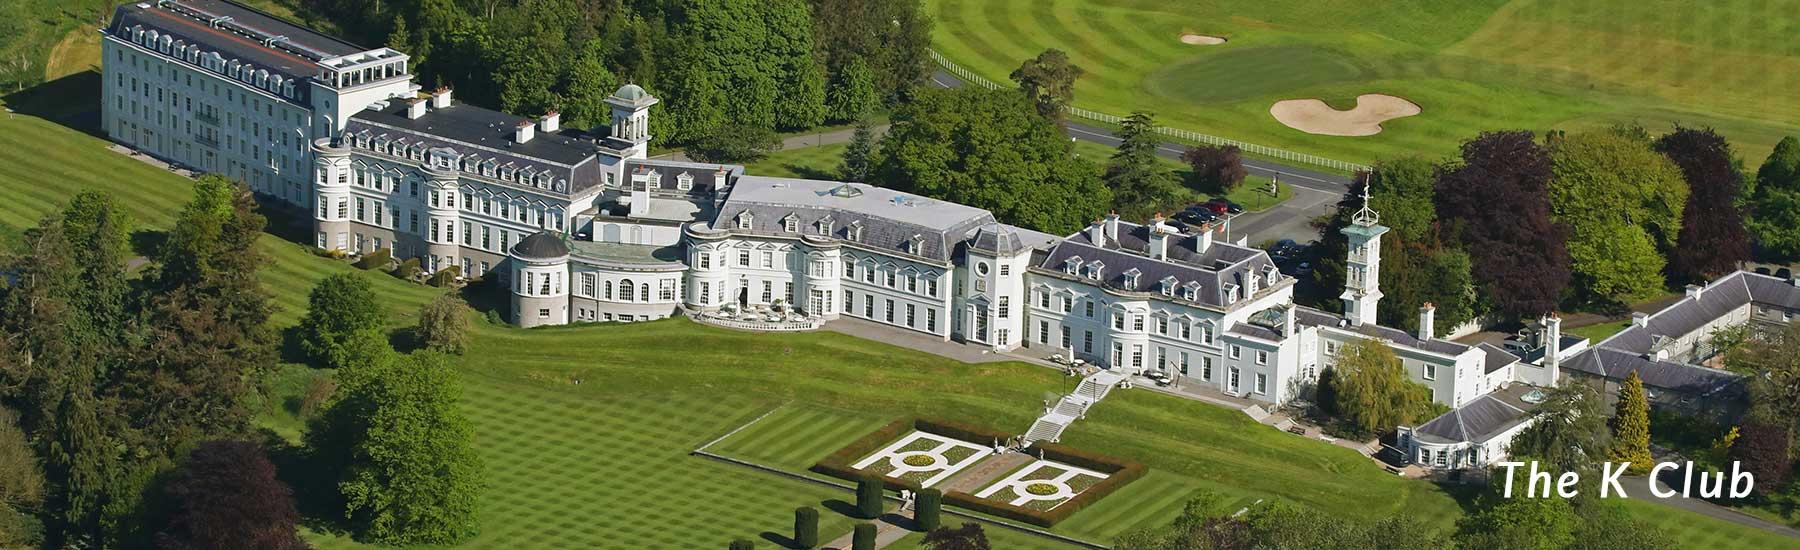 Society Golf in Ireland